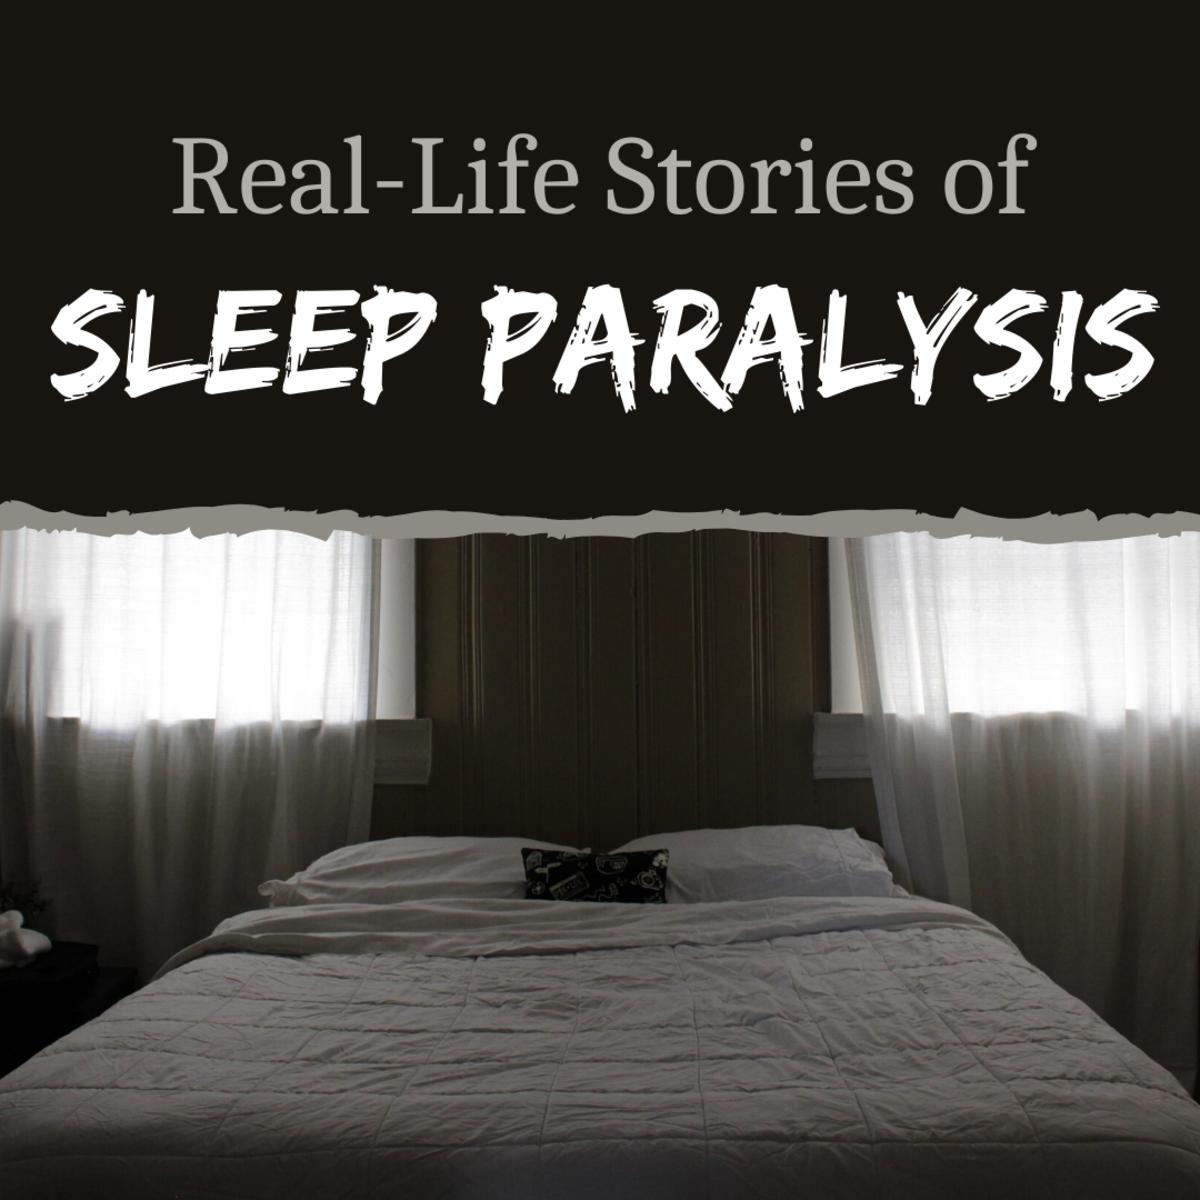 Sleep Paralysis:  When Nightmares Come to Life